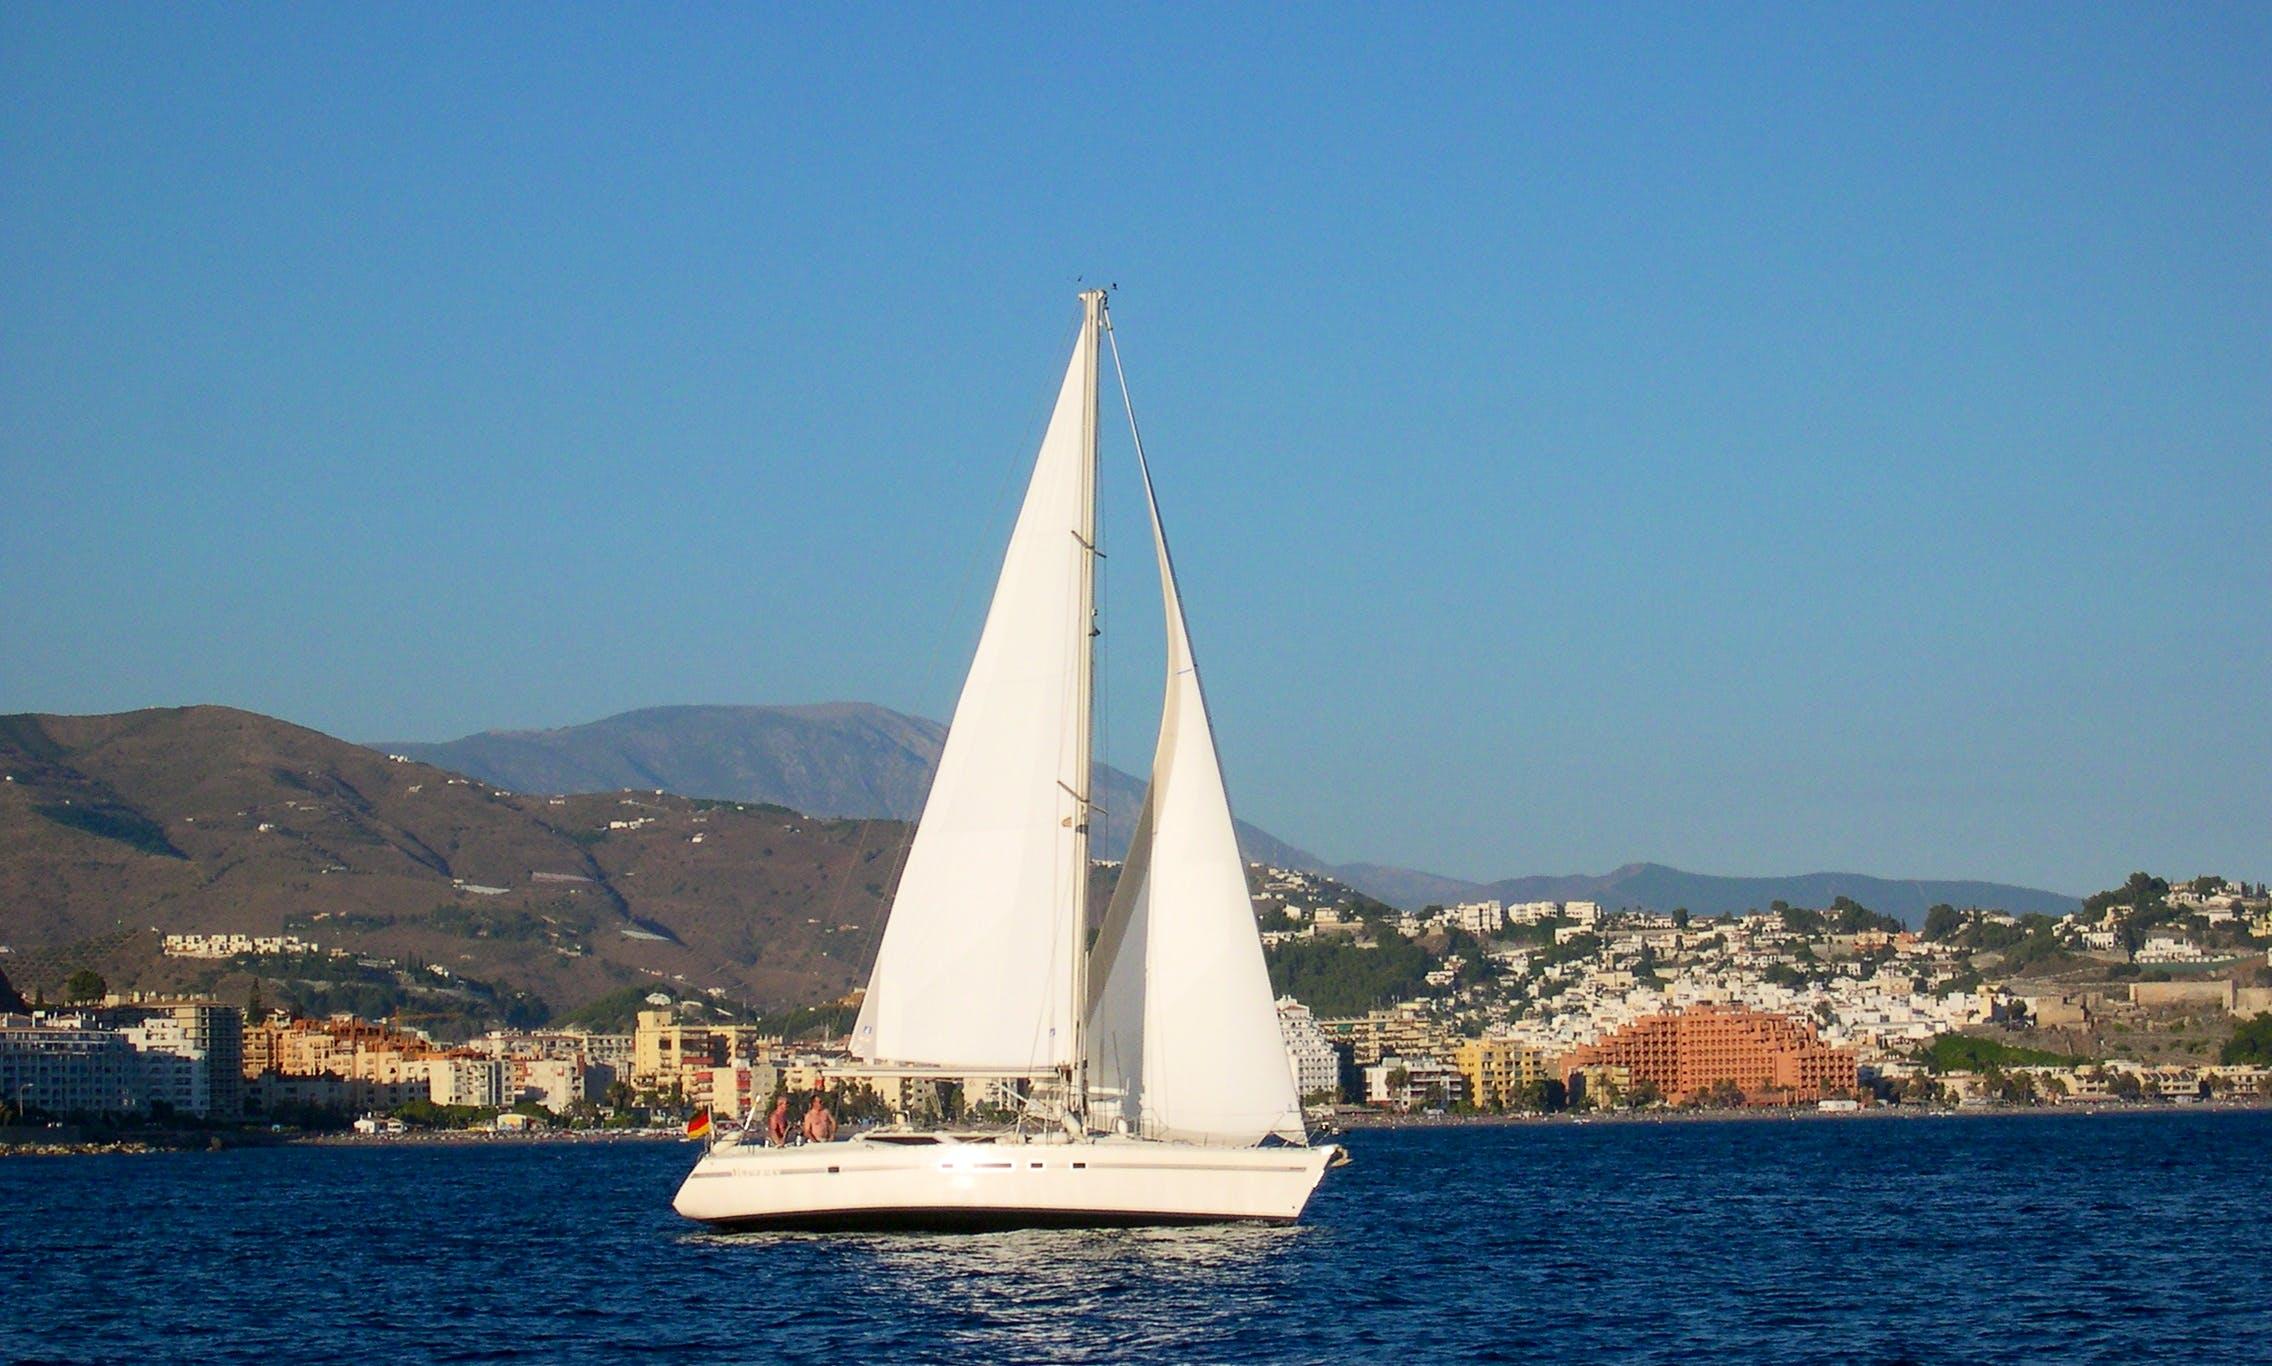 42' Jeanneau Voyage Sailing Yacht in Almuñécar, Spain